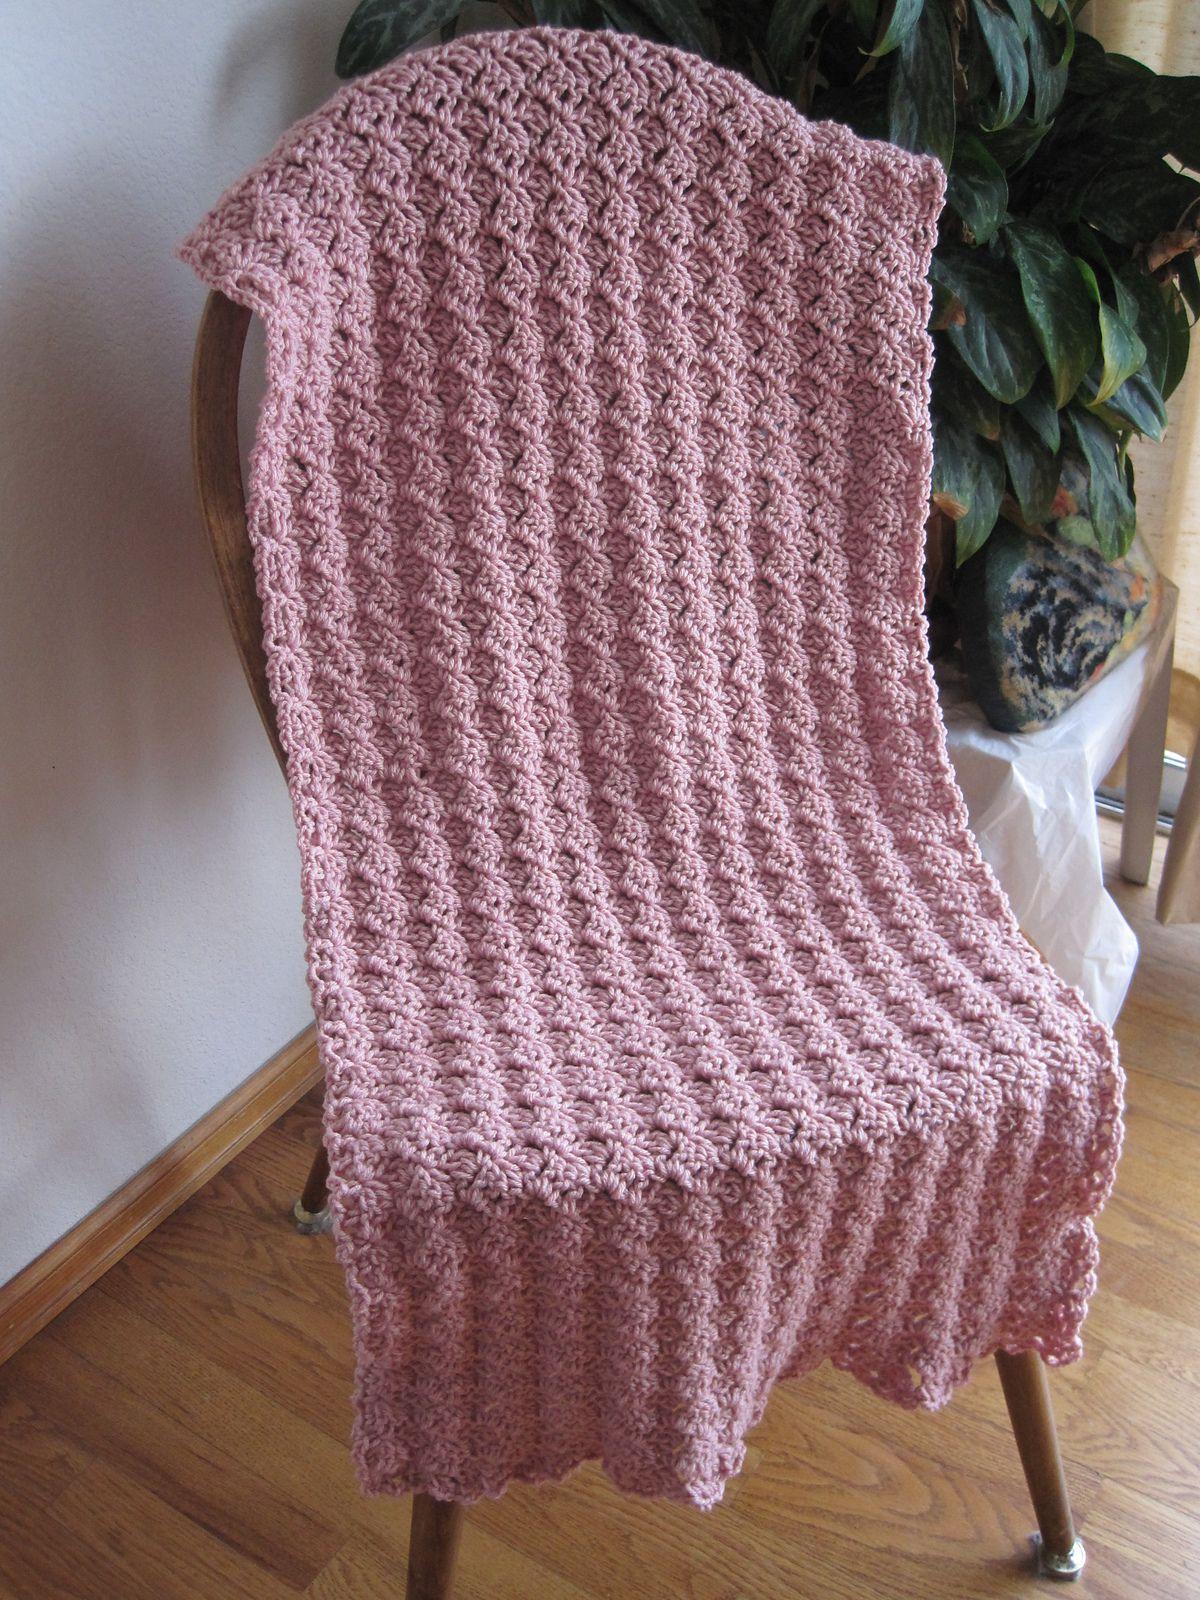 Cozy Comfort Prayer Shawl By Kathy North - Free Crochet Pattern ...